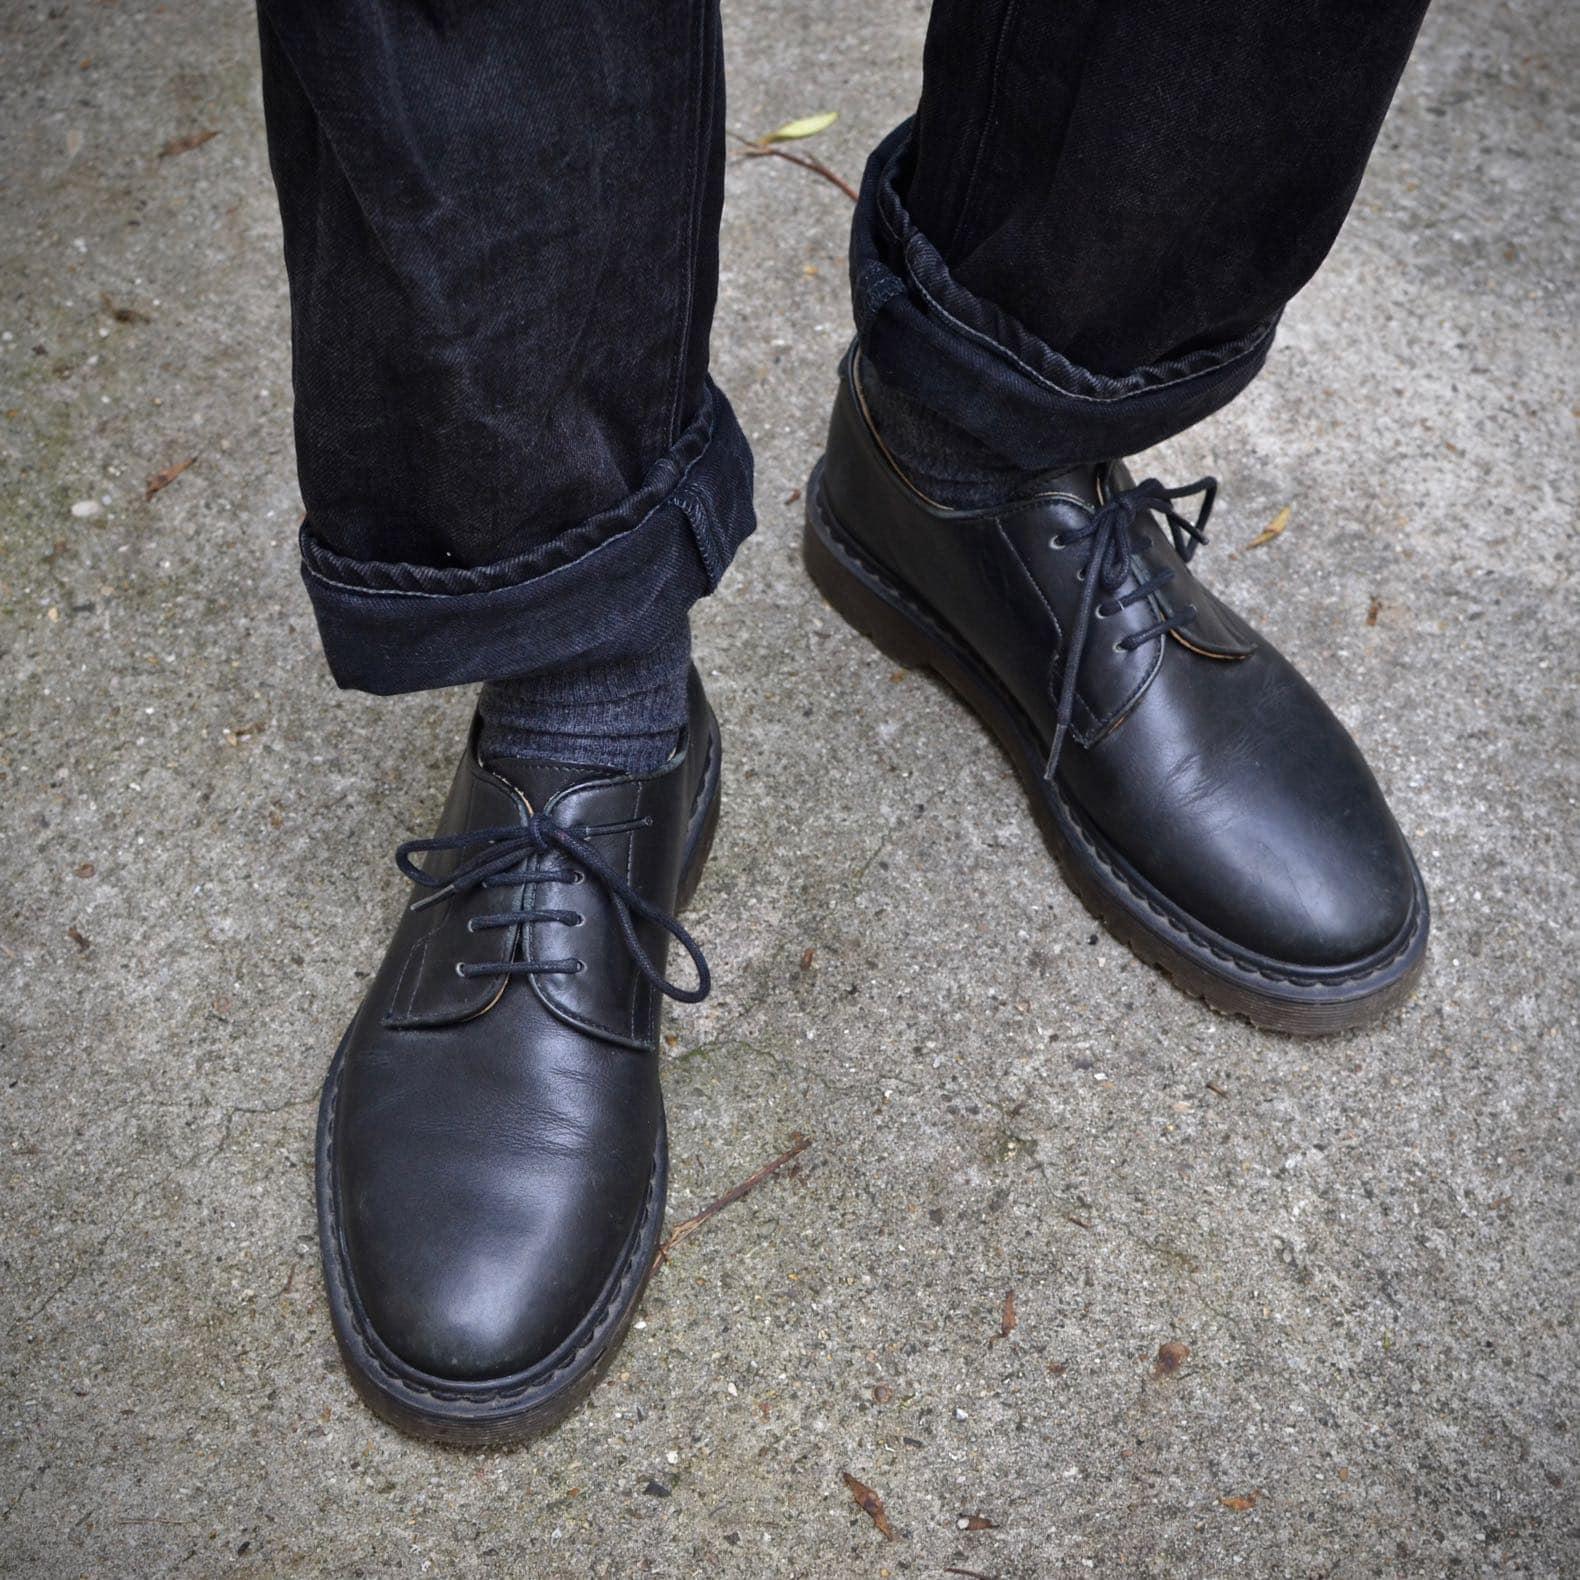 chaussures a.p.c. style dr martens black